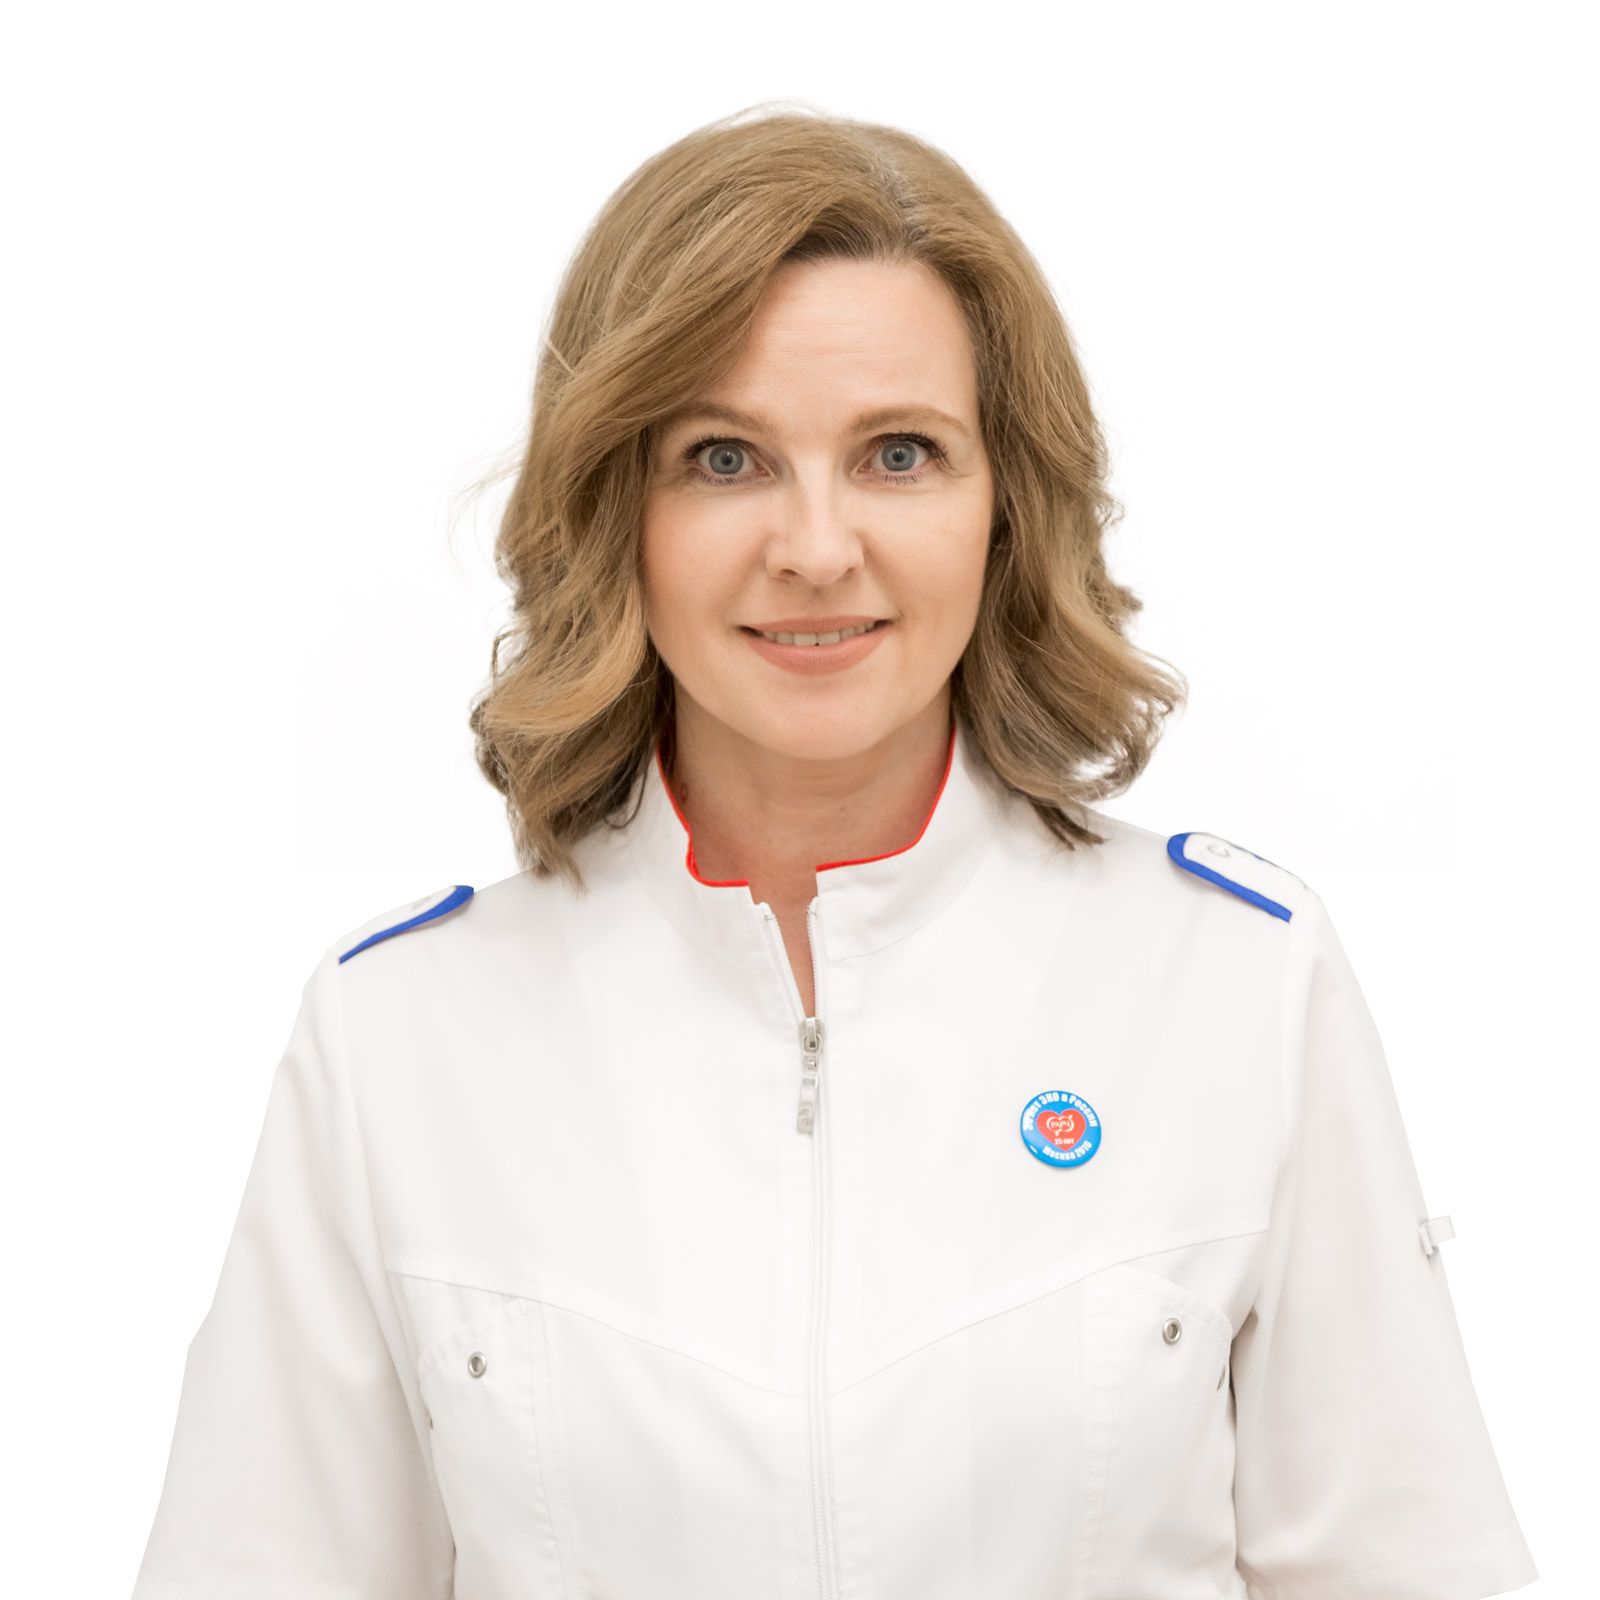 Гуменецкая Наталия Валентиновна